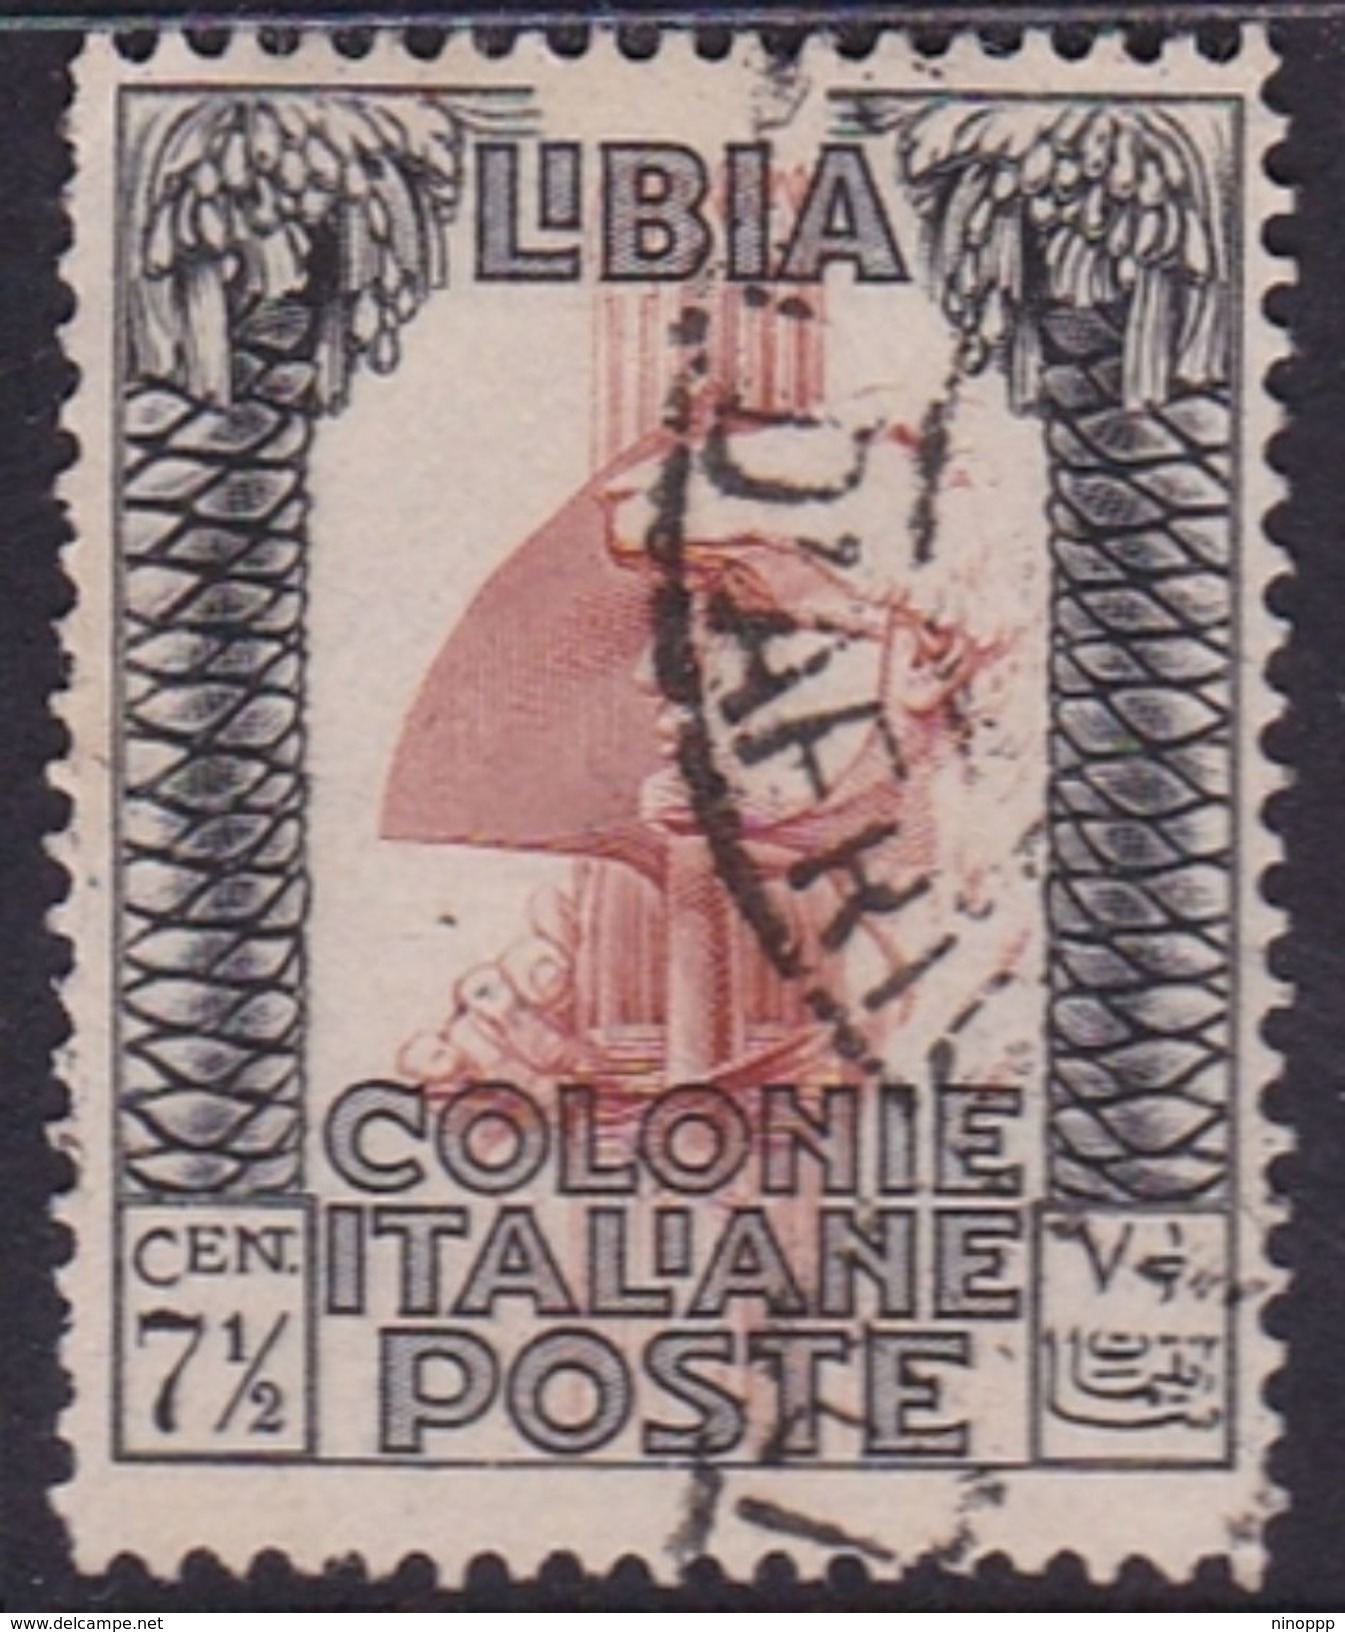 Italy-Colonies And Territories-Libya S 103 1931 Roman Legionary 7,5 C Perf 14,used - Libya